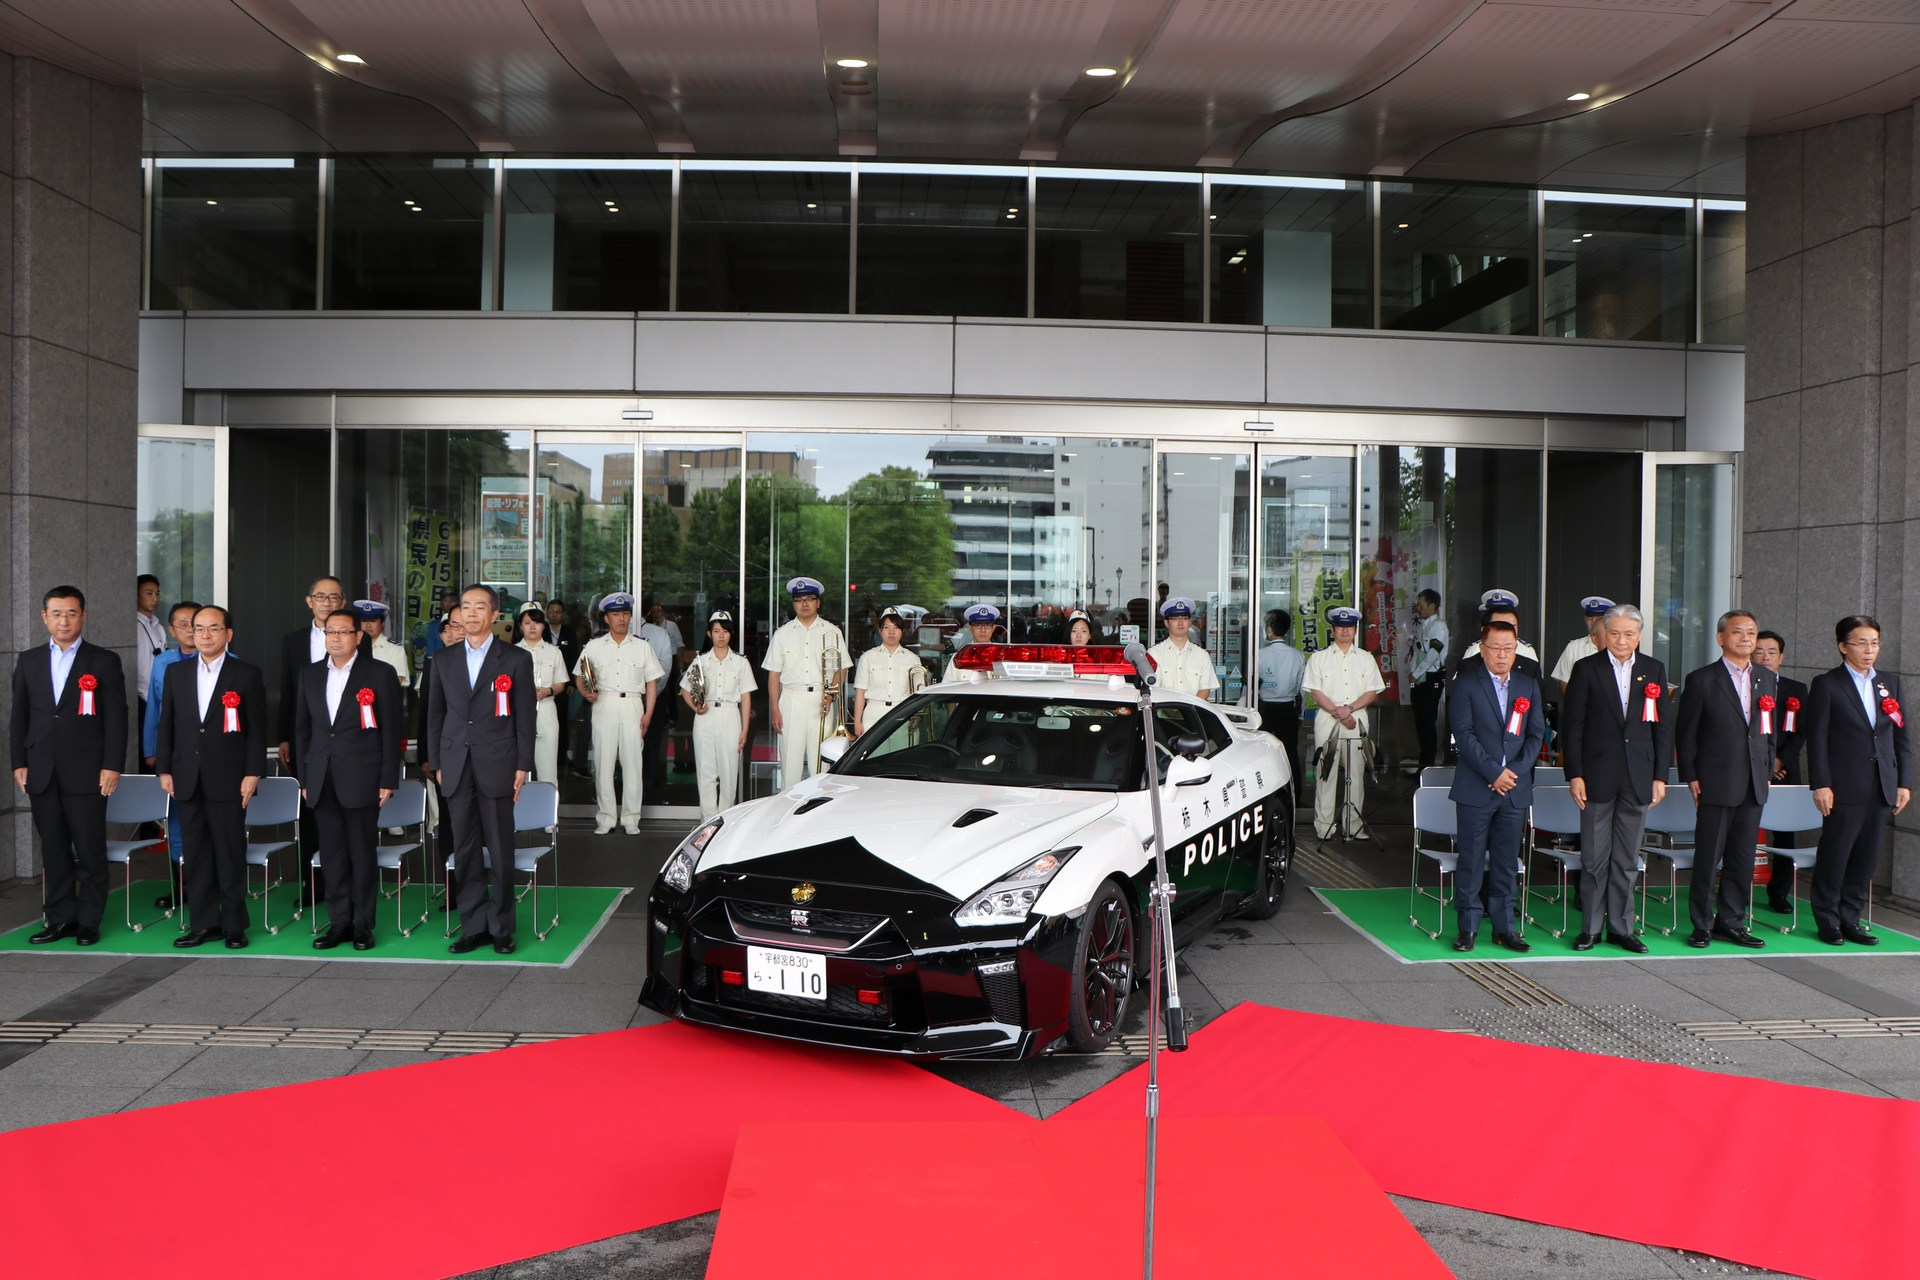 Nissan_GT-R_Police_Car_0002